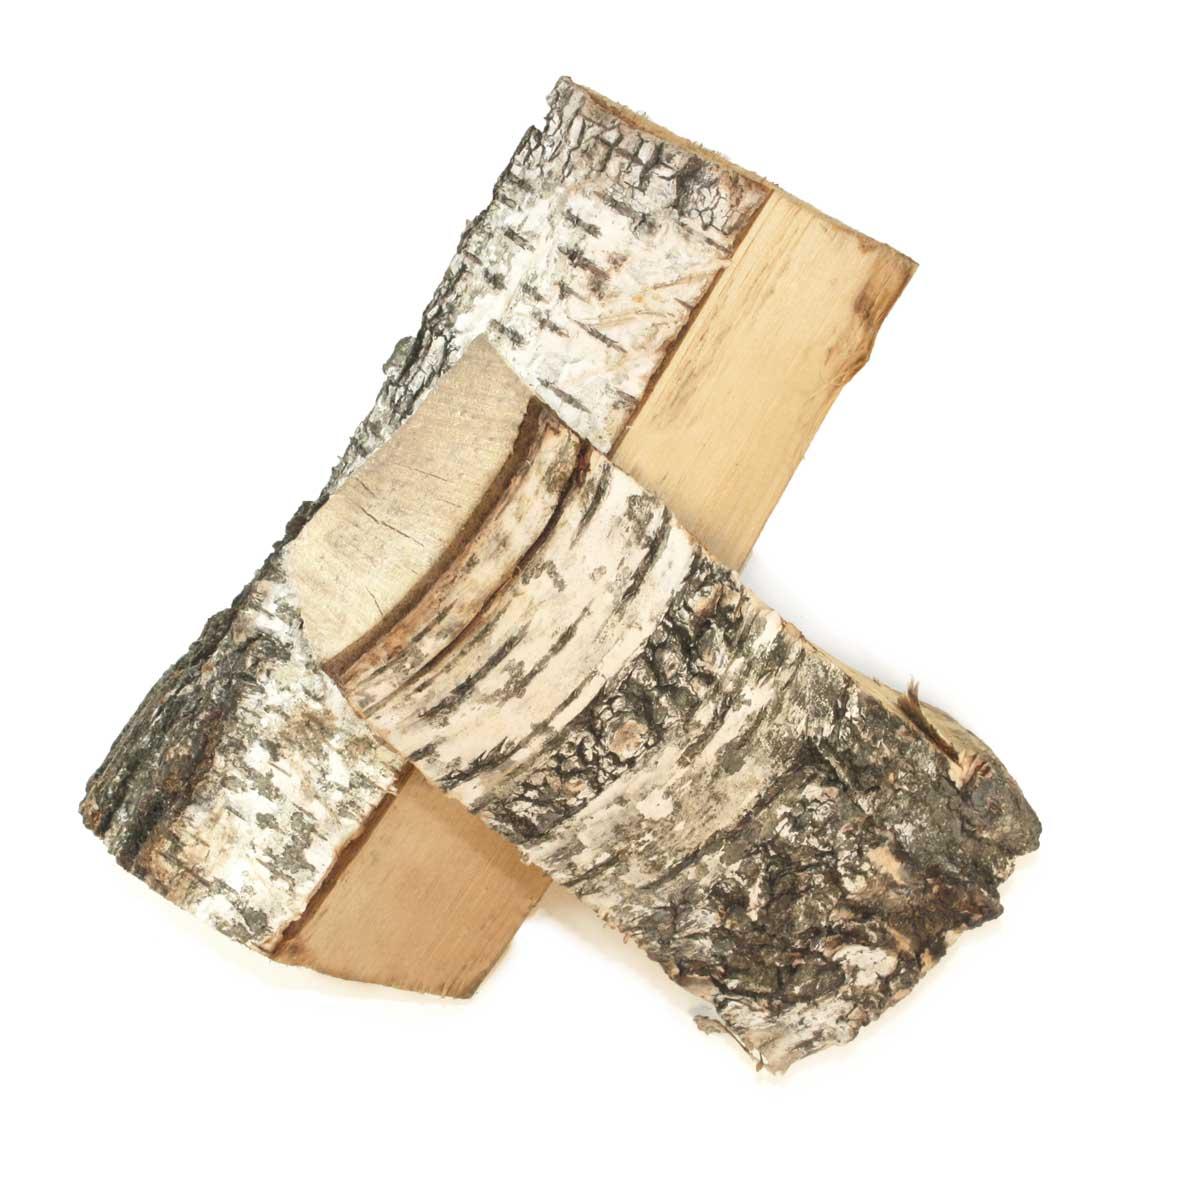 brennholz birke auf palette g nstig online kaufen paligo. Black Bedroom Furniture Sets. Home Design Ideas